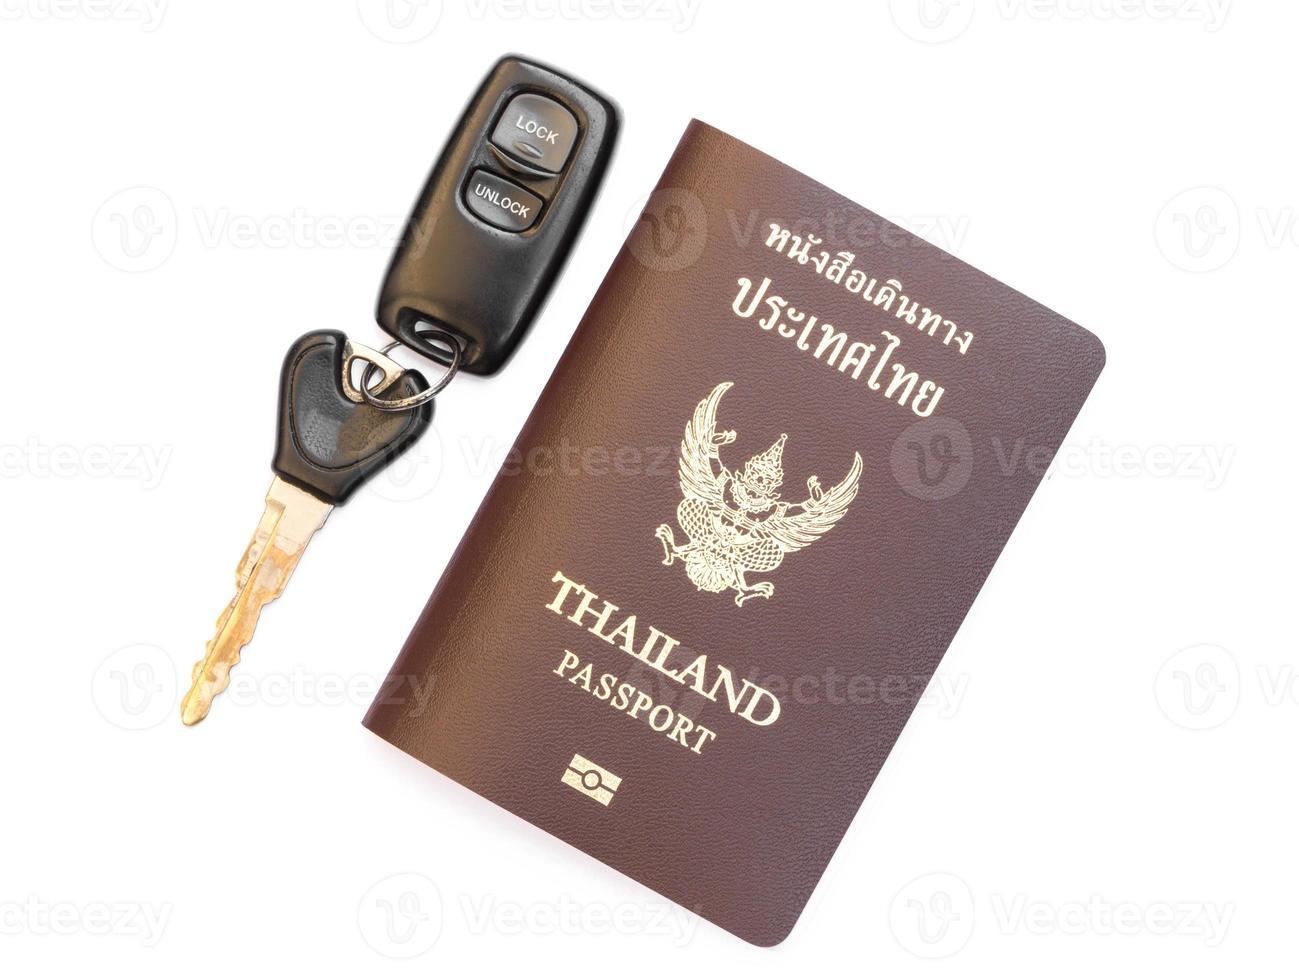 Thailand passport with car key on white photo